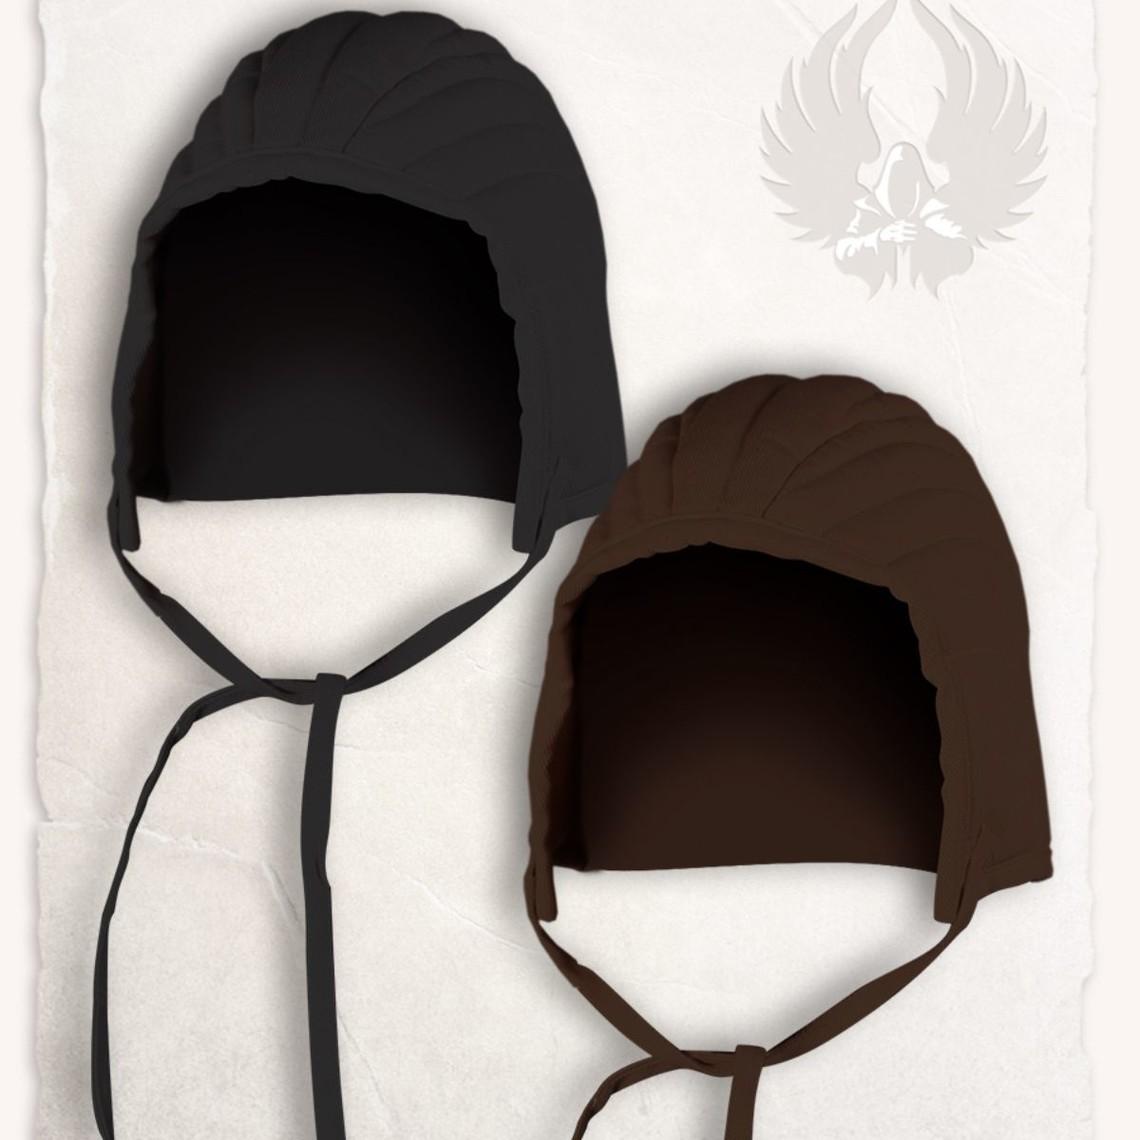 Mytholon casquillo de armado gambesón marrón lona de algodón Leopold